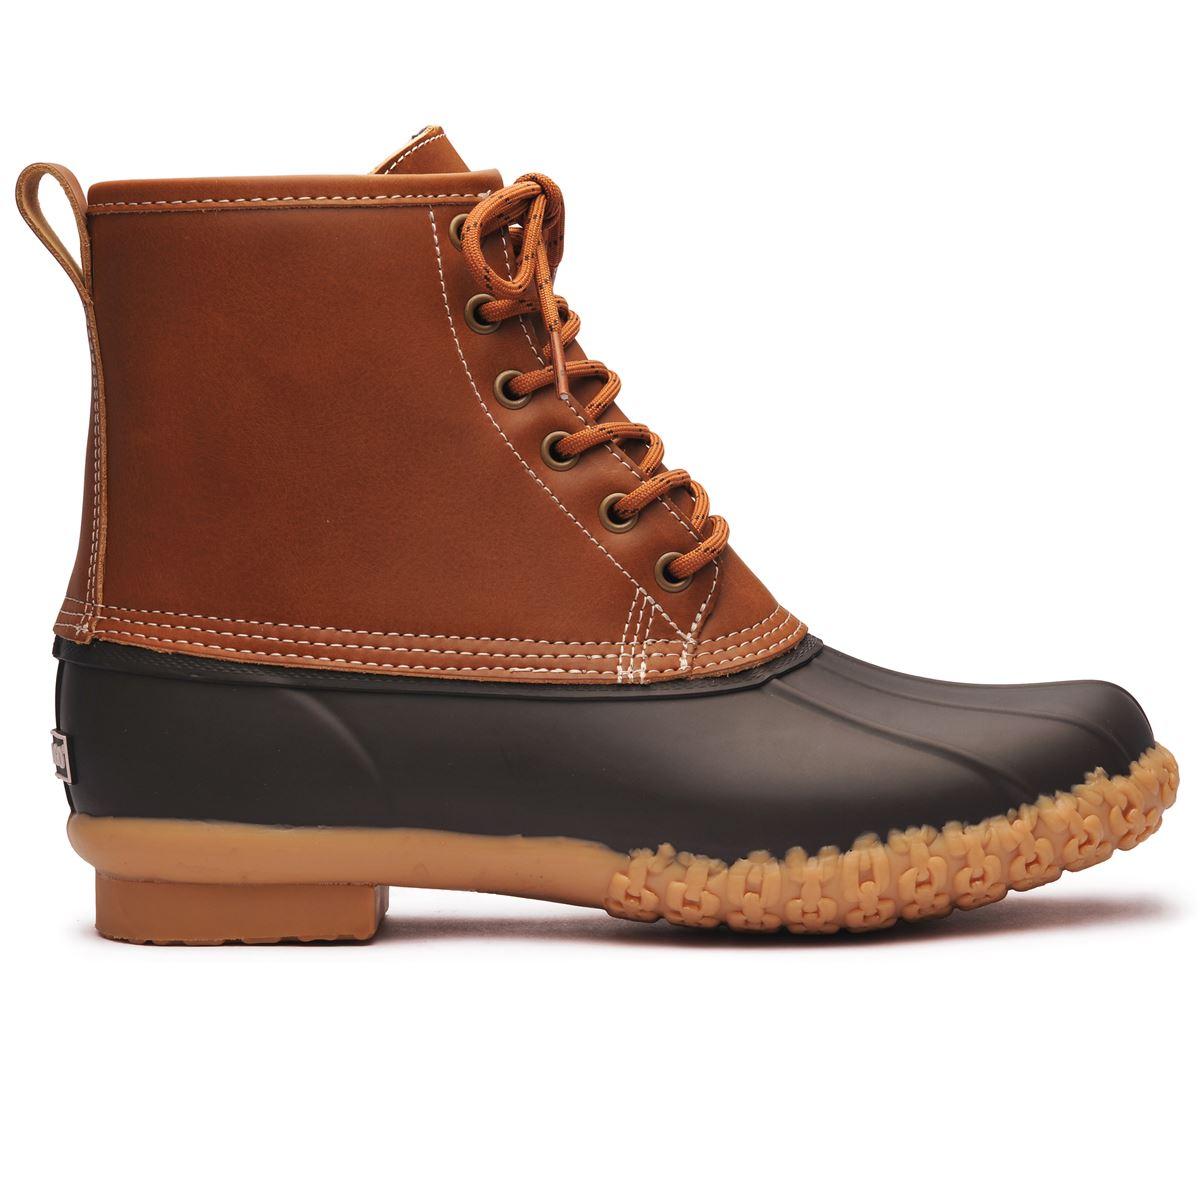 Sebago Stivali In Gomma uomo-7001H60